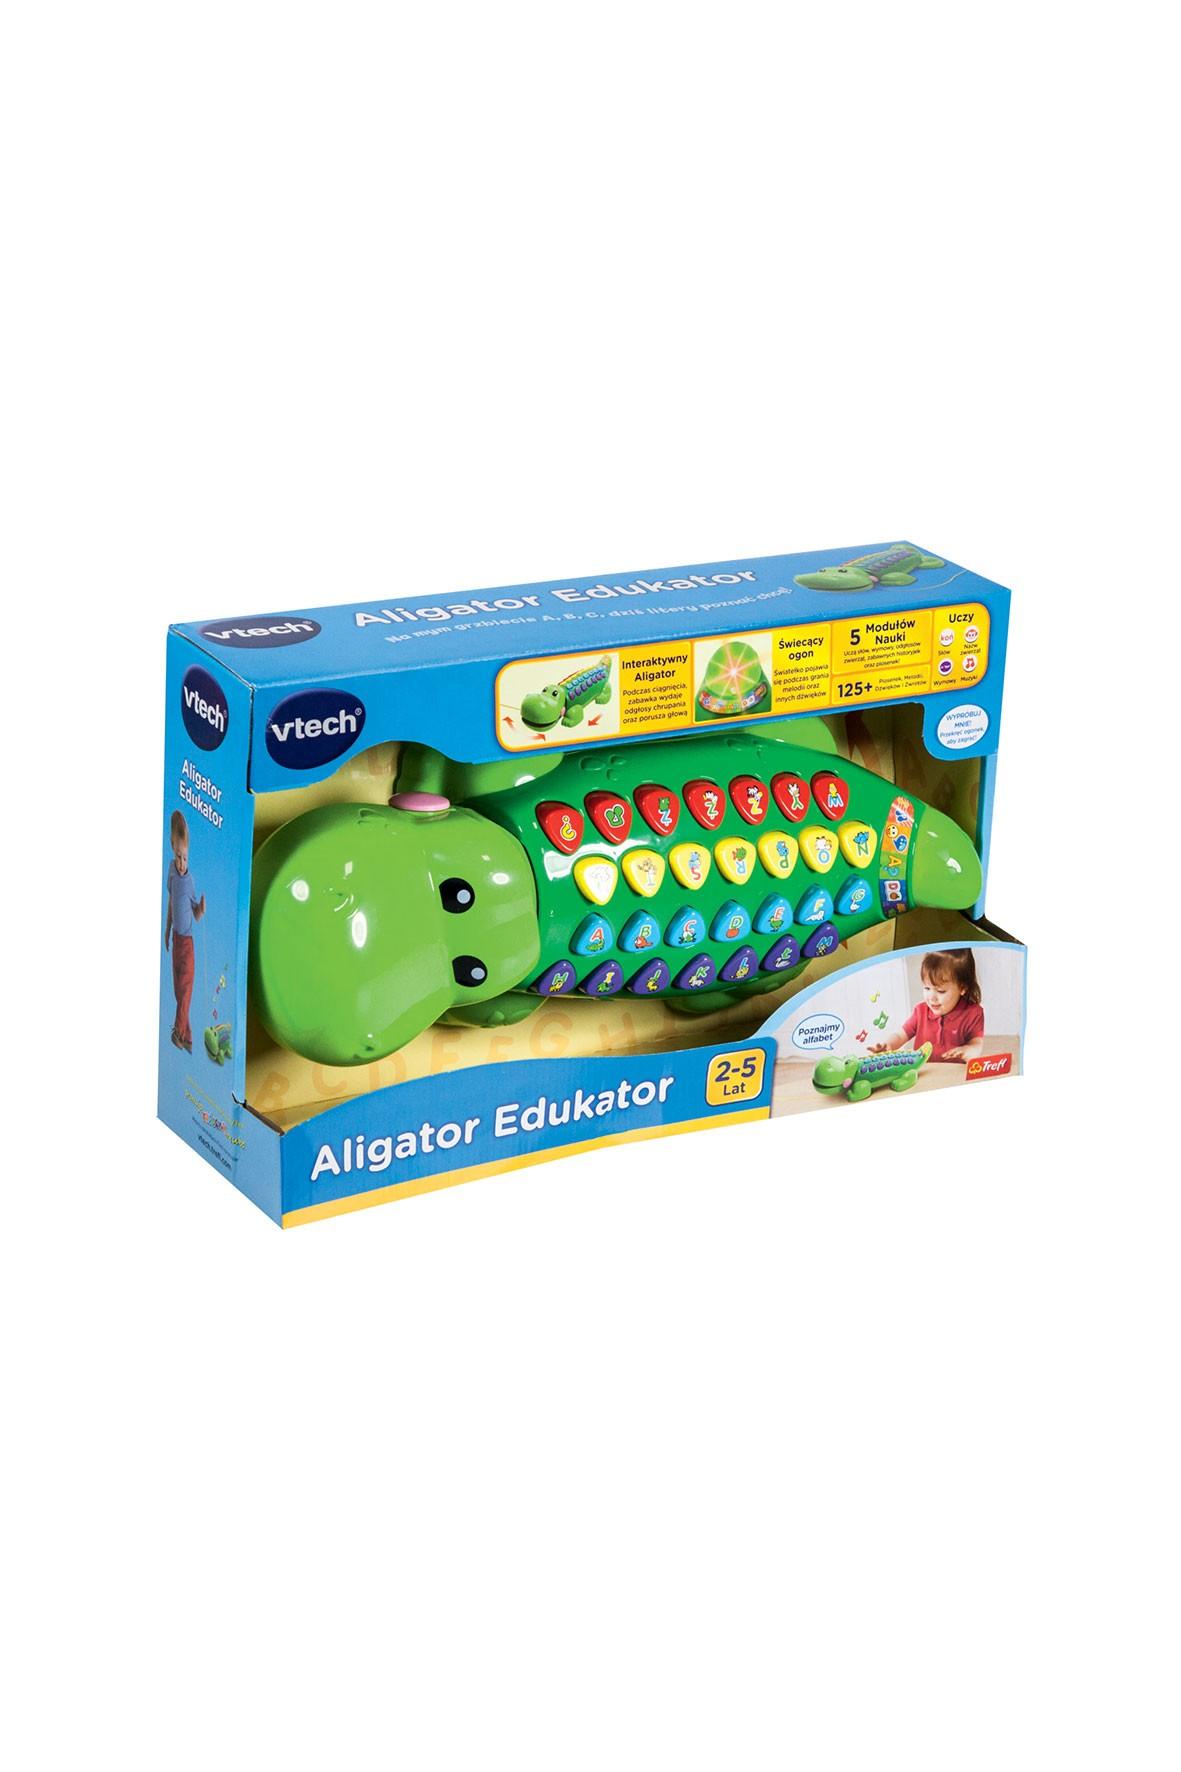 Literkowy Aligator